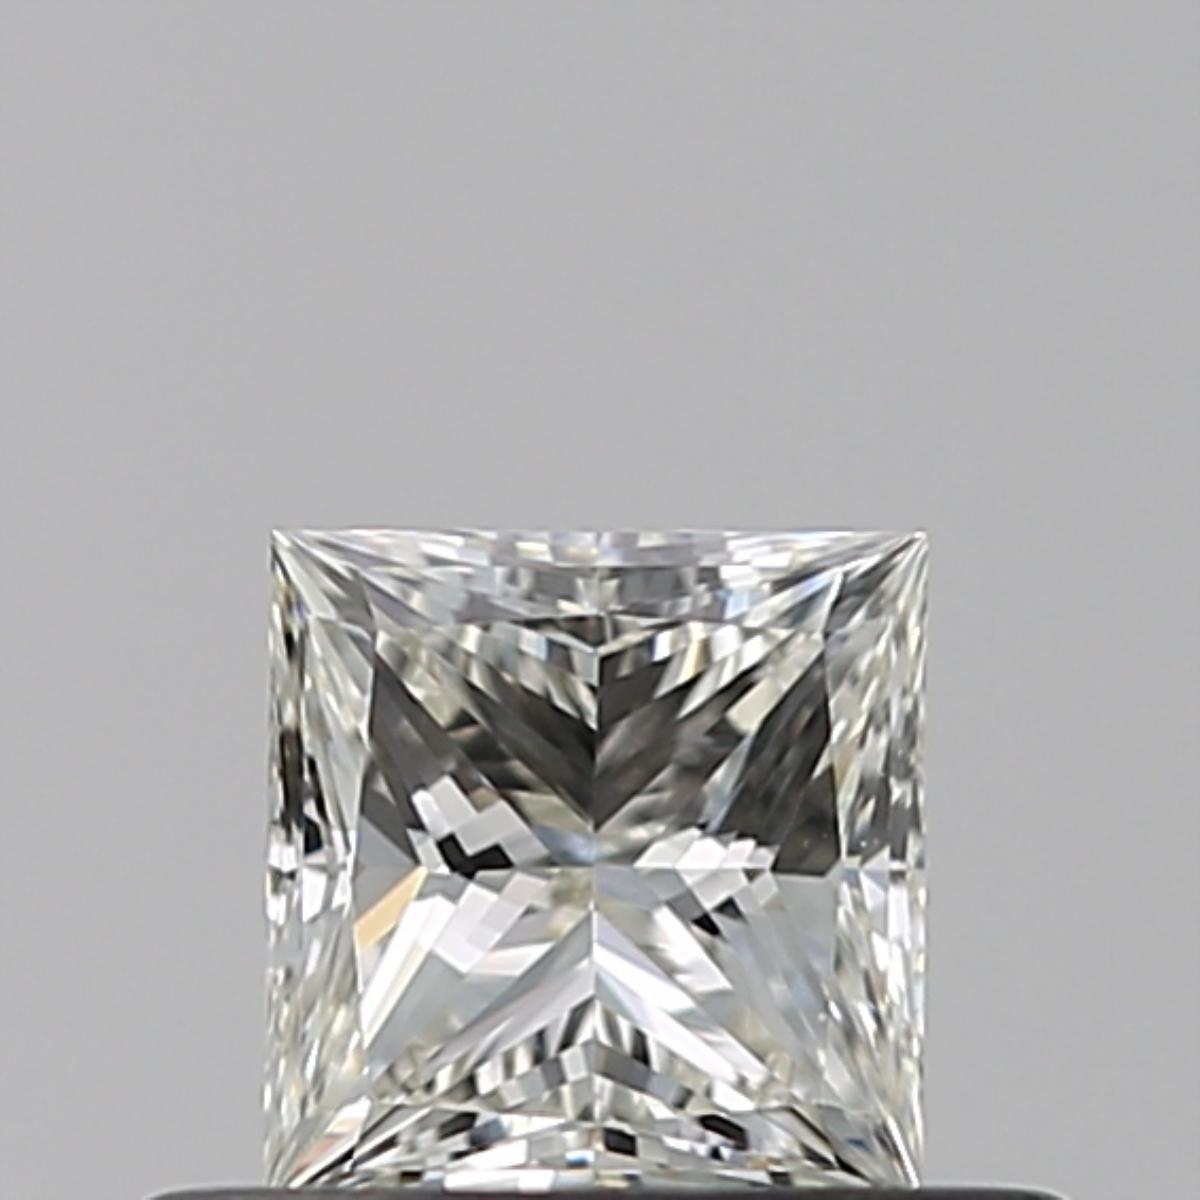 0.40 ct Princess Cut Diamond : J / VVS2